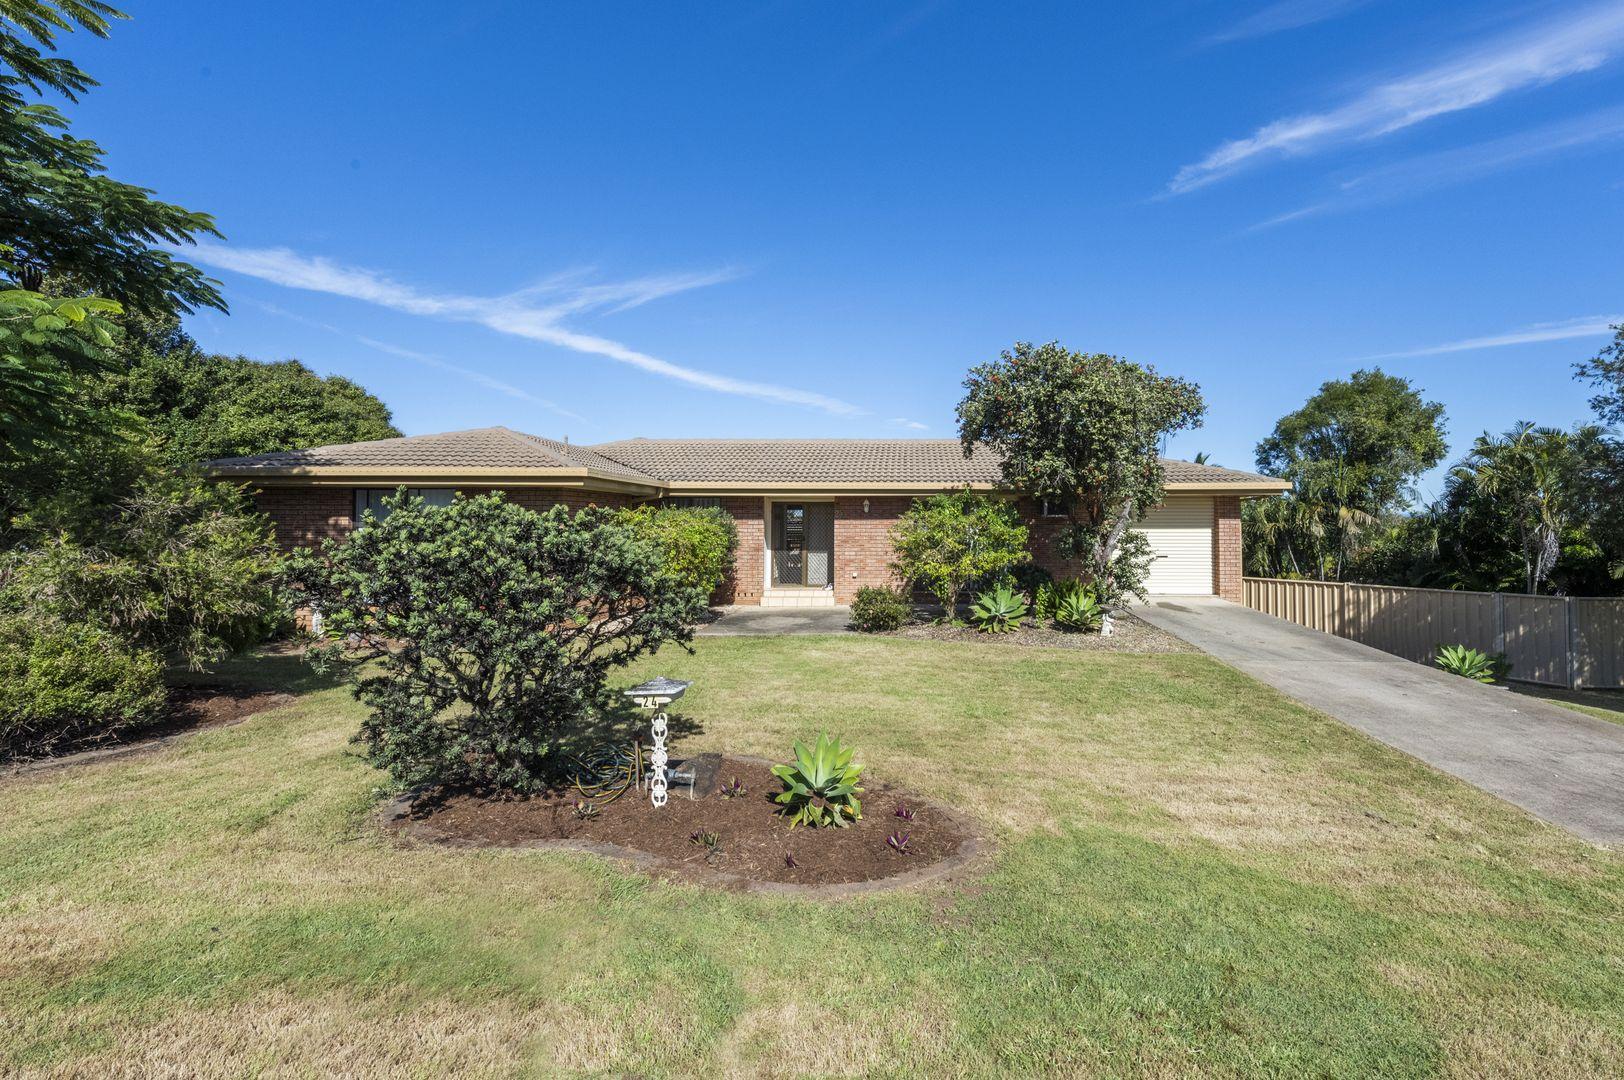 24 Shadybower Drive, Junction Hill NSW 2460